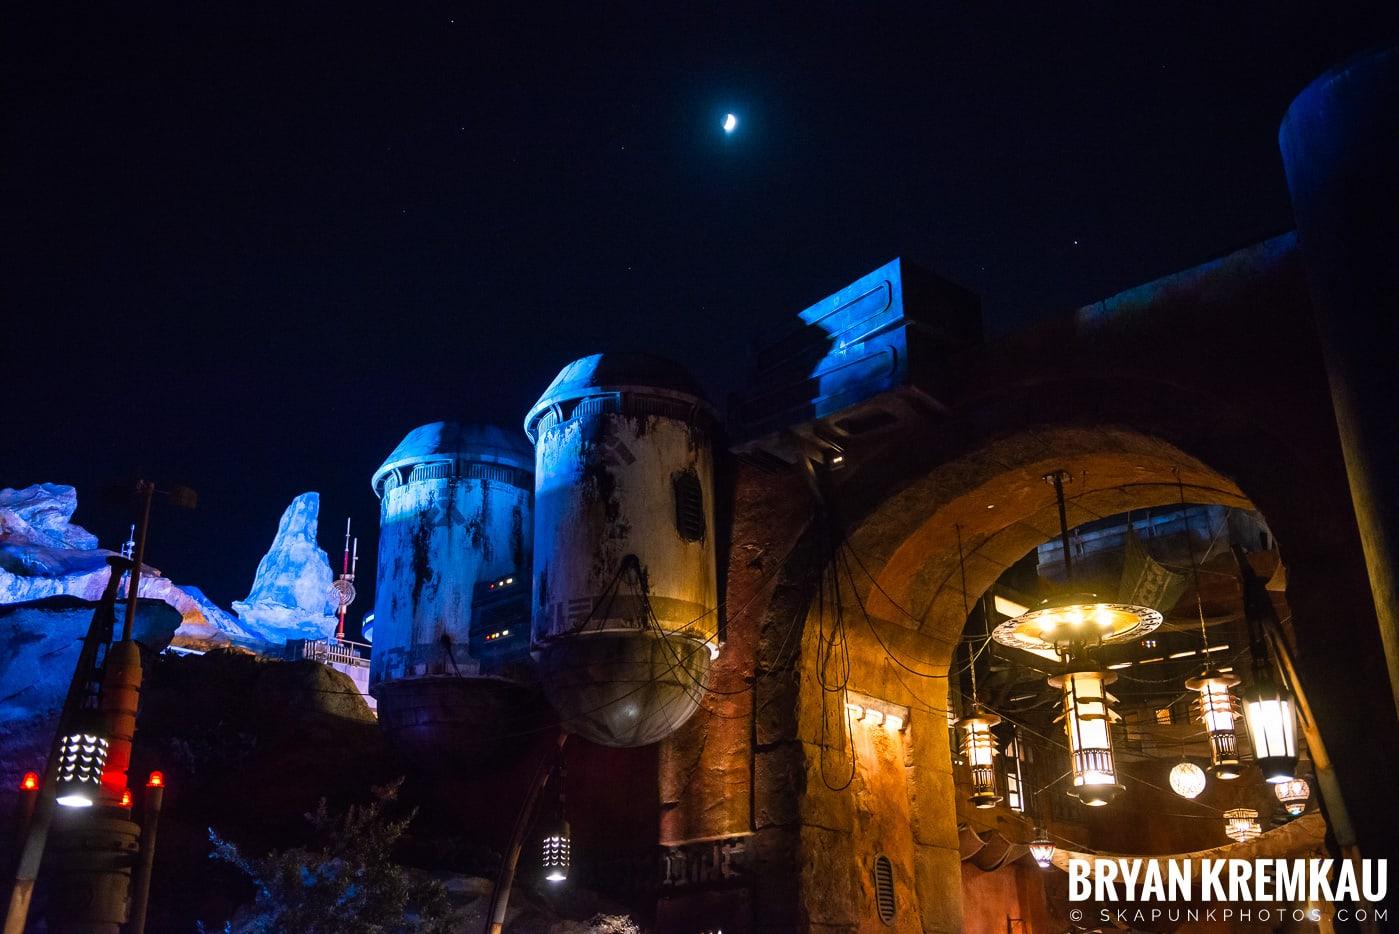 Walt Disney World Vacation: Day 6 (Magic Kingdom, Epcot, Disney's Hollywood Studios) - 10.4.19 (28)